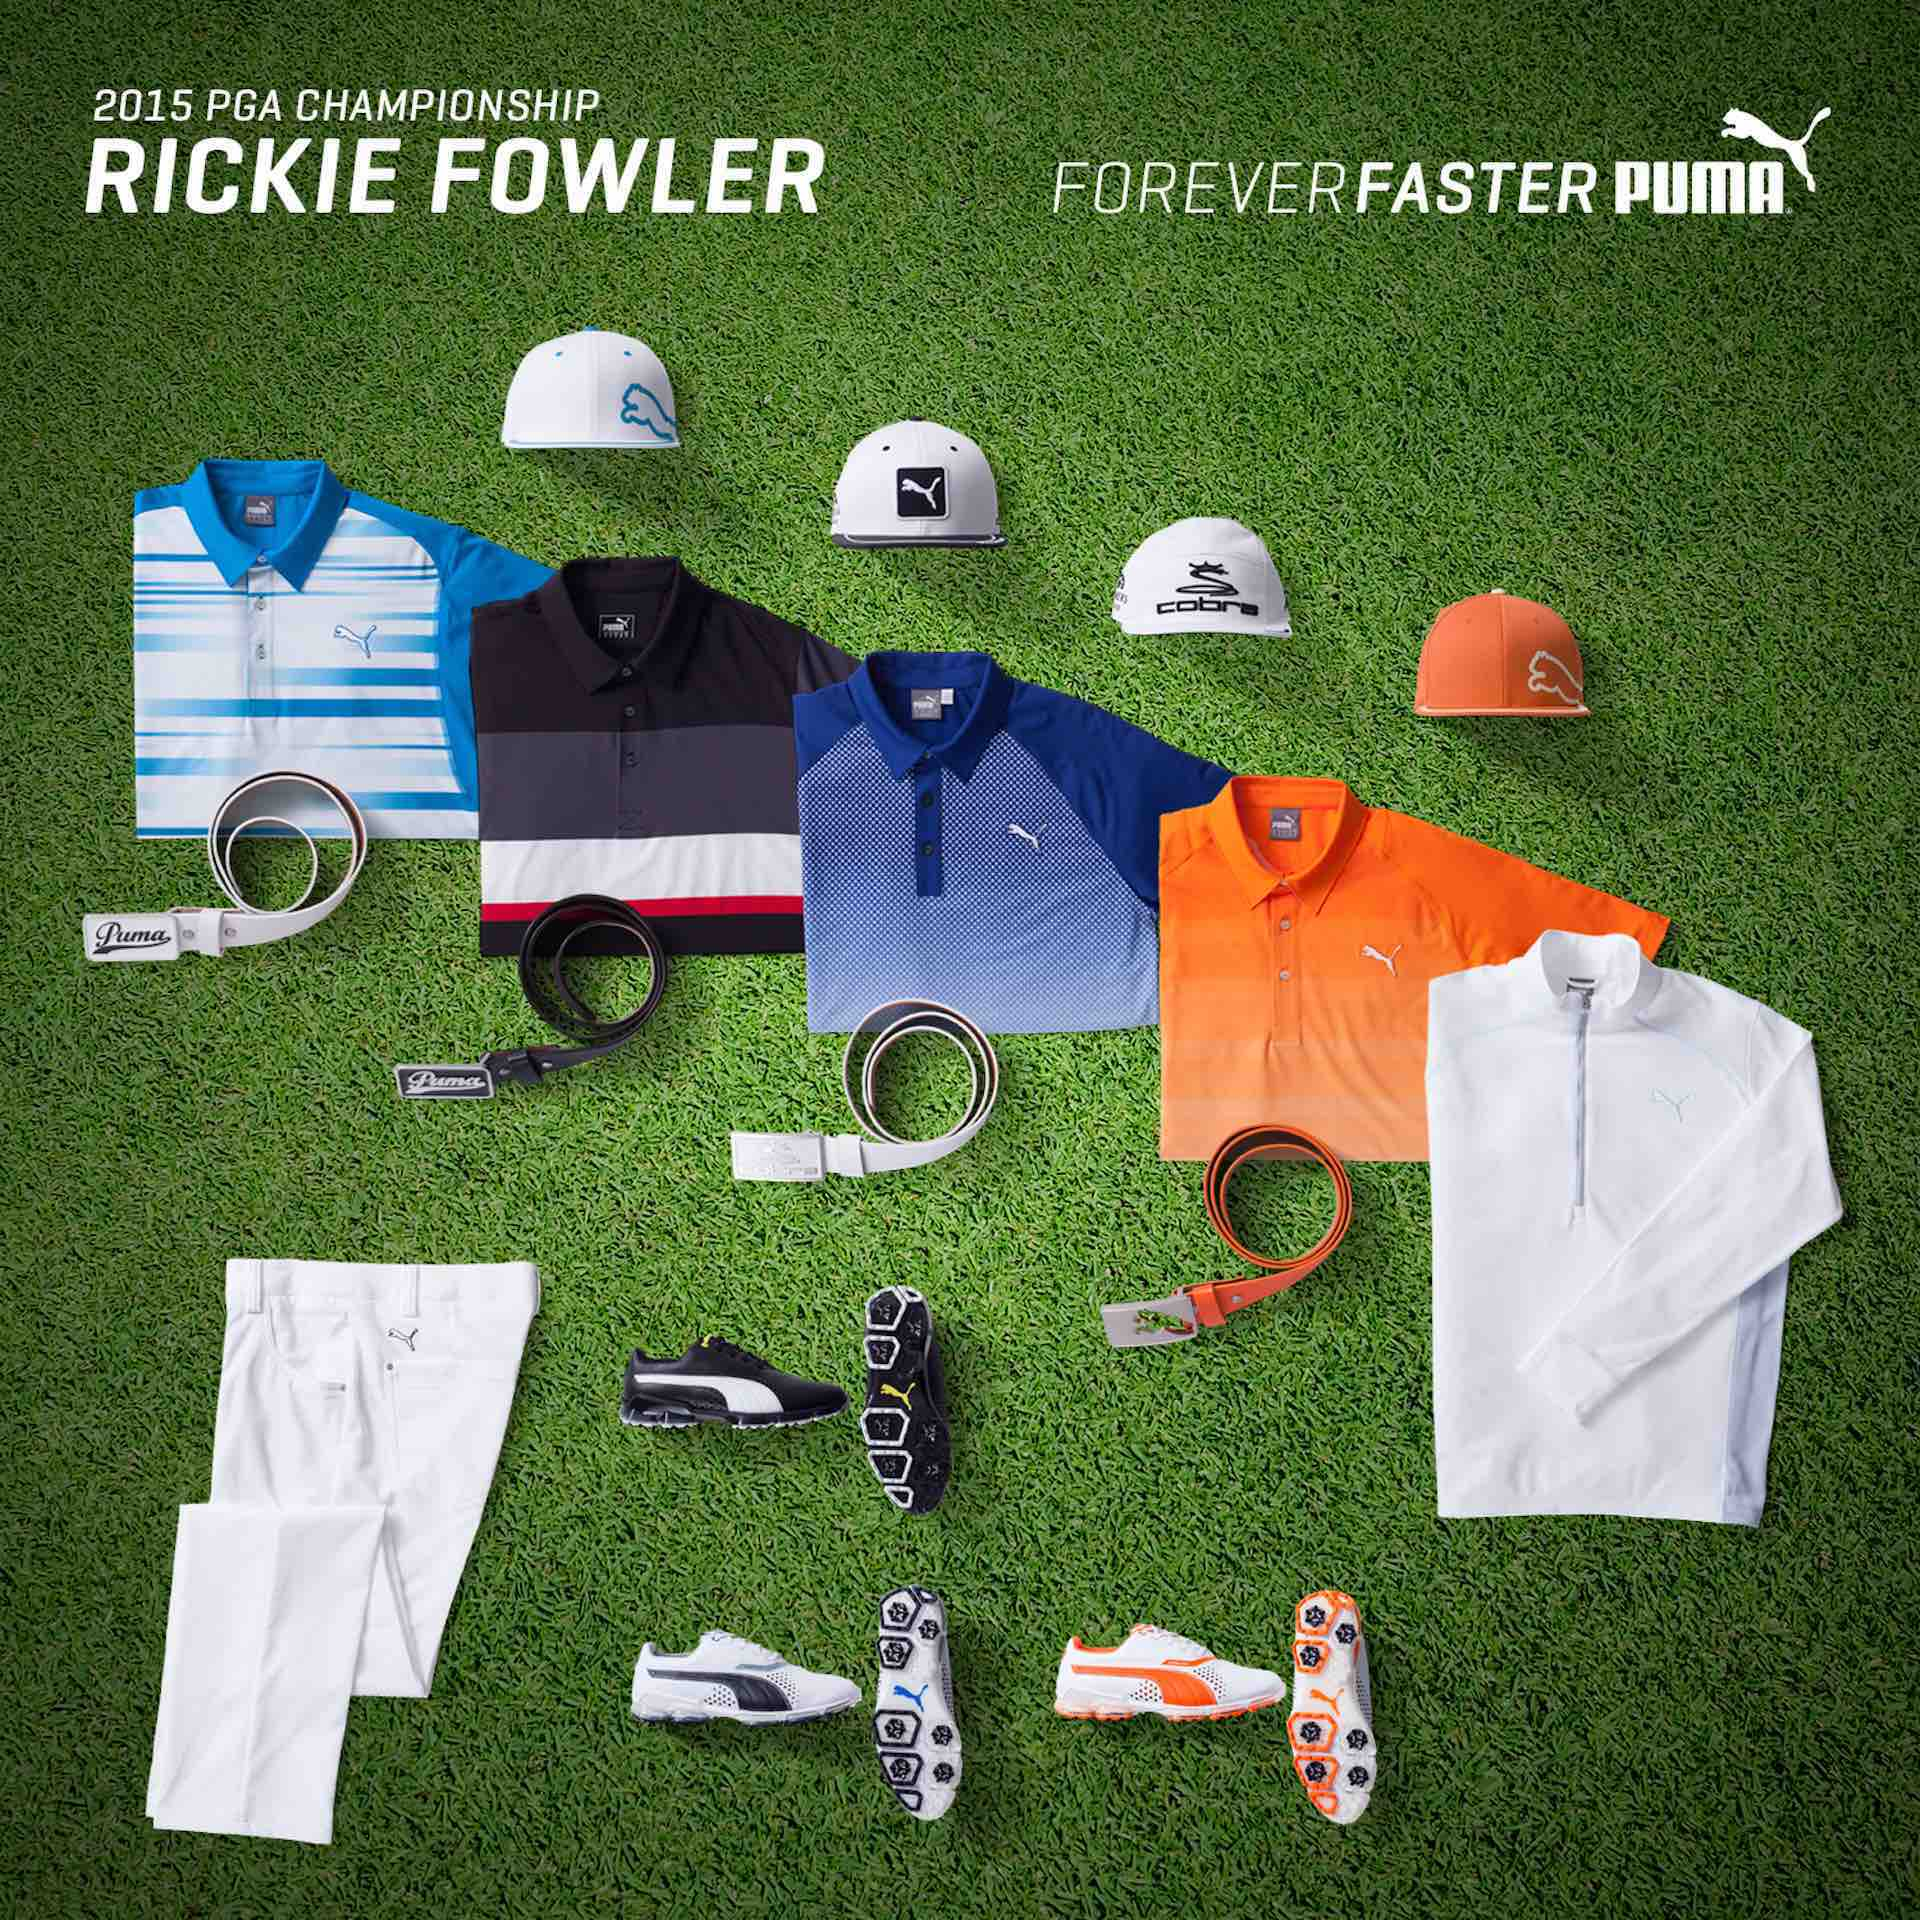 US PGA CHAMPIONSHIP FASHION SPECIAL: RICKIE FOWLER